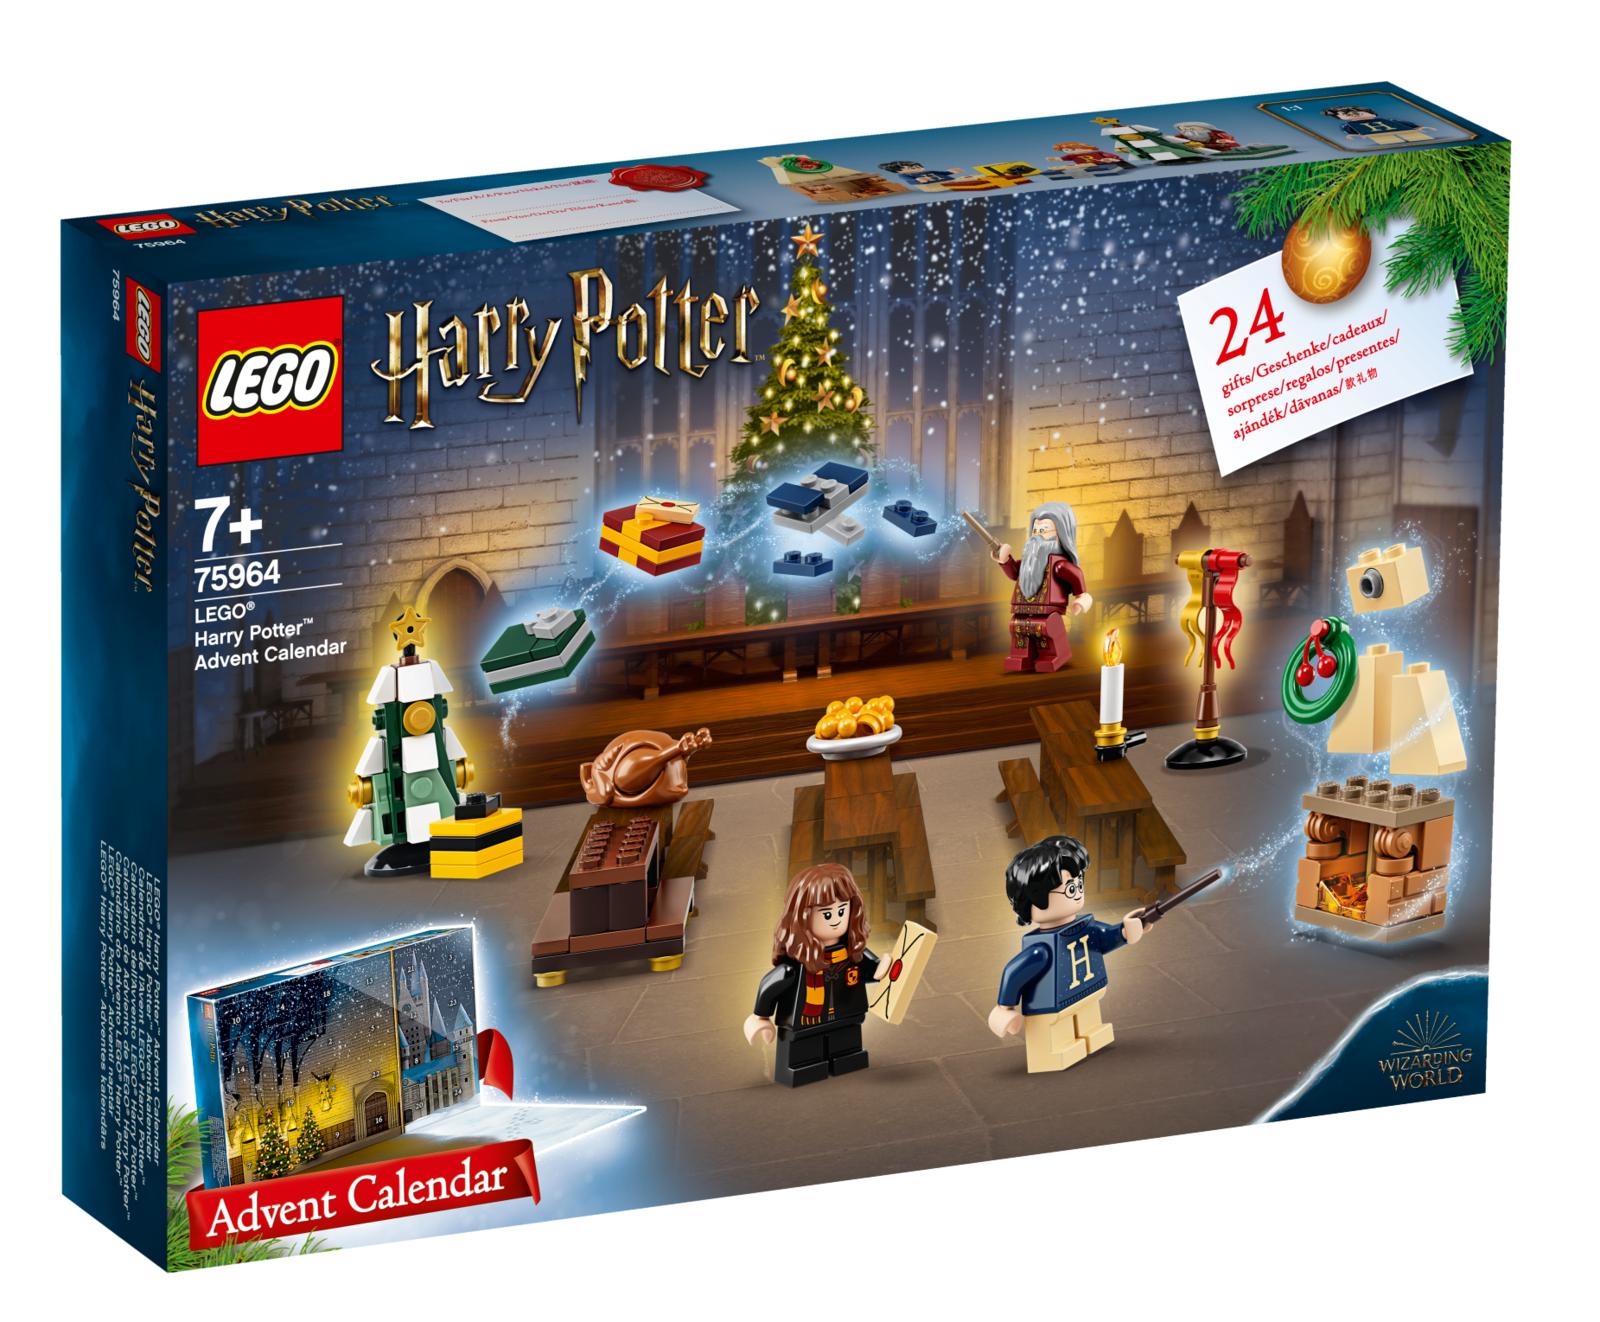 LEGO Harry Potter - 2019 Advent Calendar (75964) image